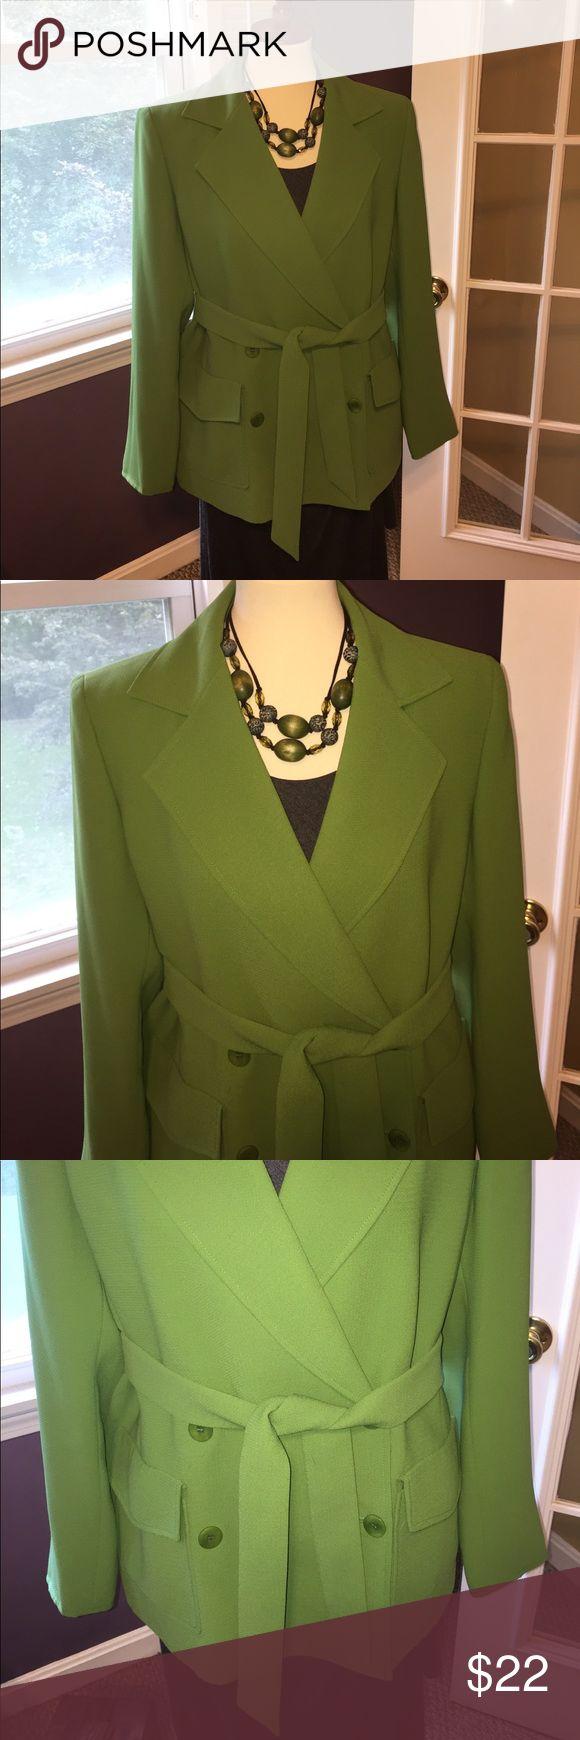 Kasper olive green blazer. Size 12. Kasper olive green blazer. Size 12. 100% polyester. Small pull on one sleeve see photo. Belted waist is optional. kasper Jackets & Coats Blazers